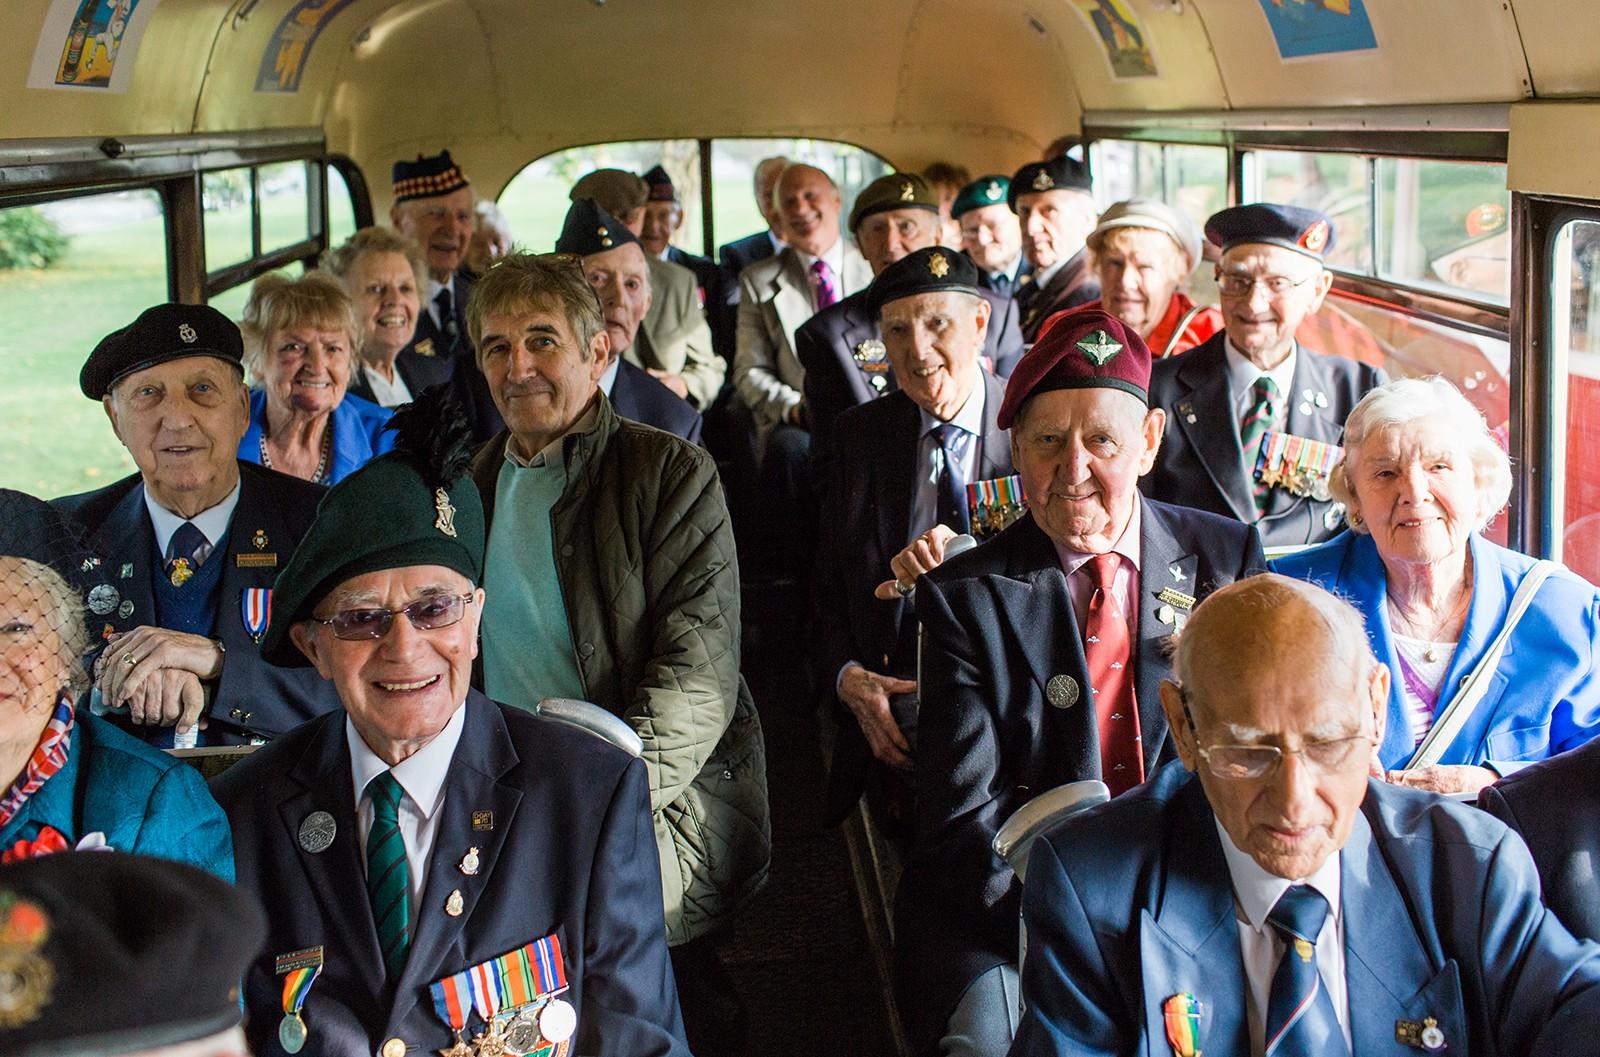 WW2 veterans at Goodwood